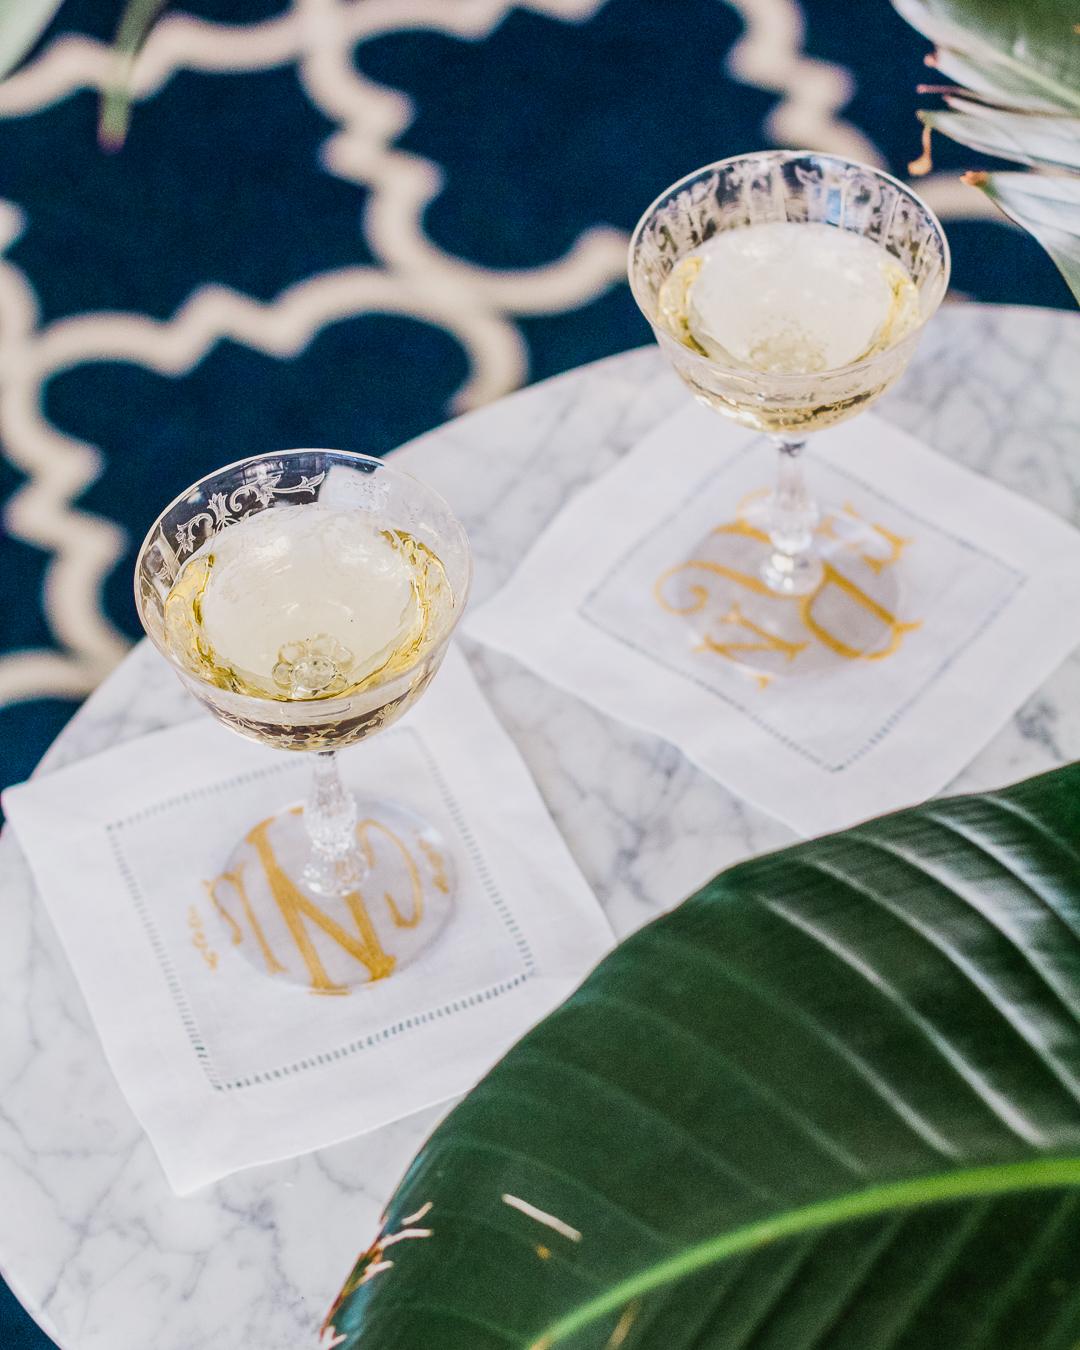 champagne on linen cocktail napkins